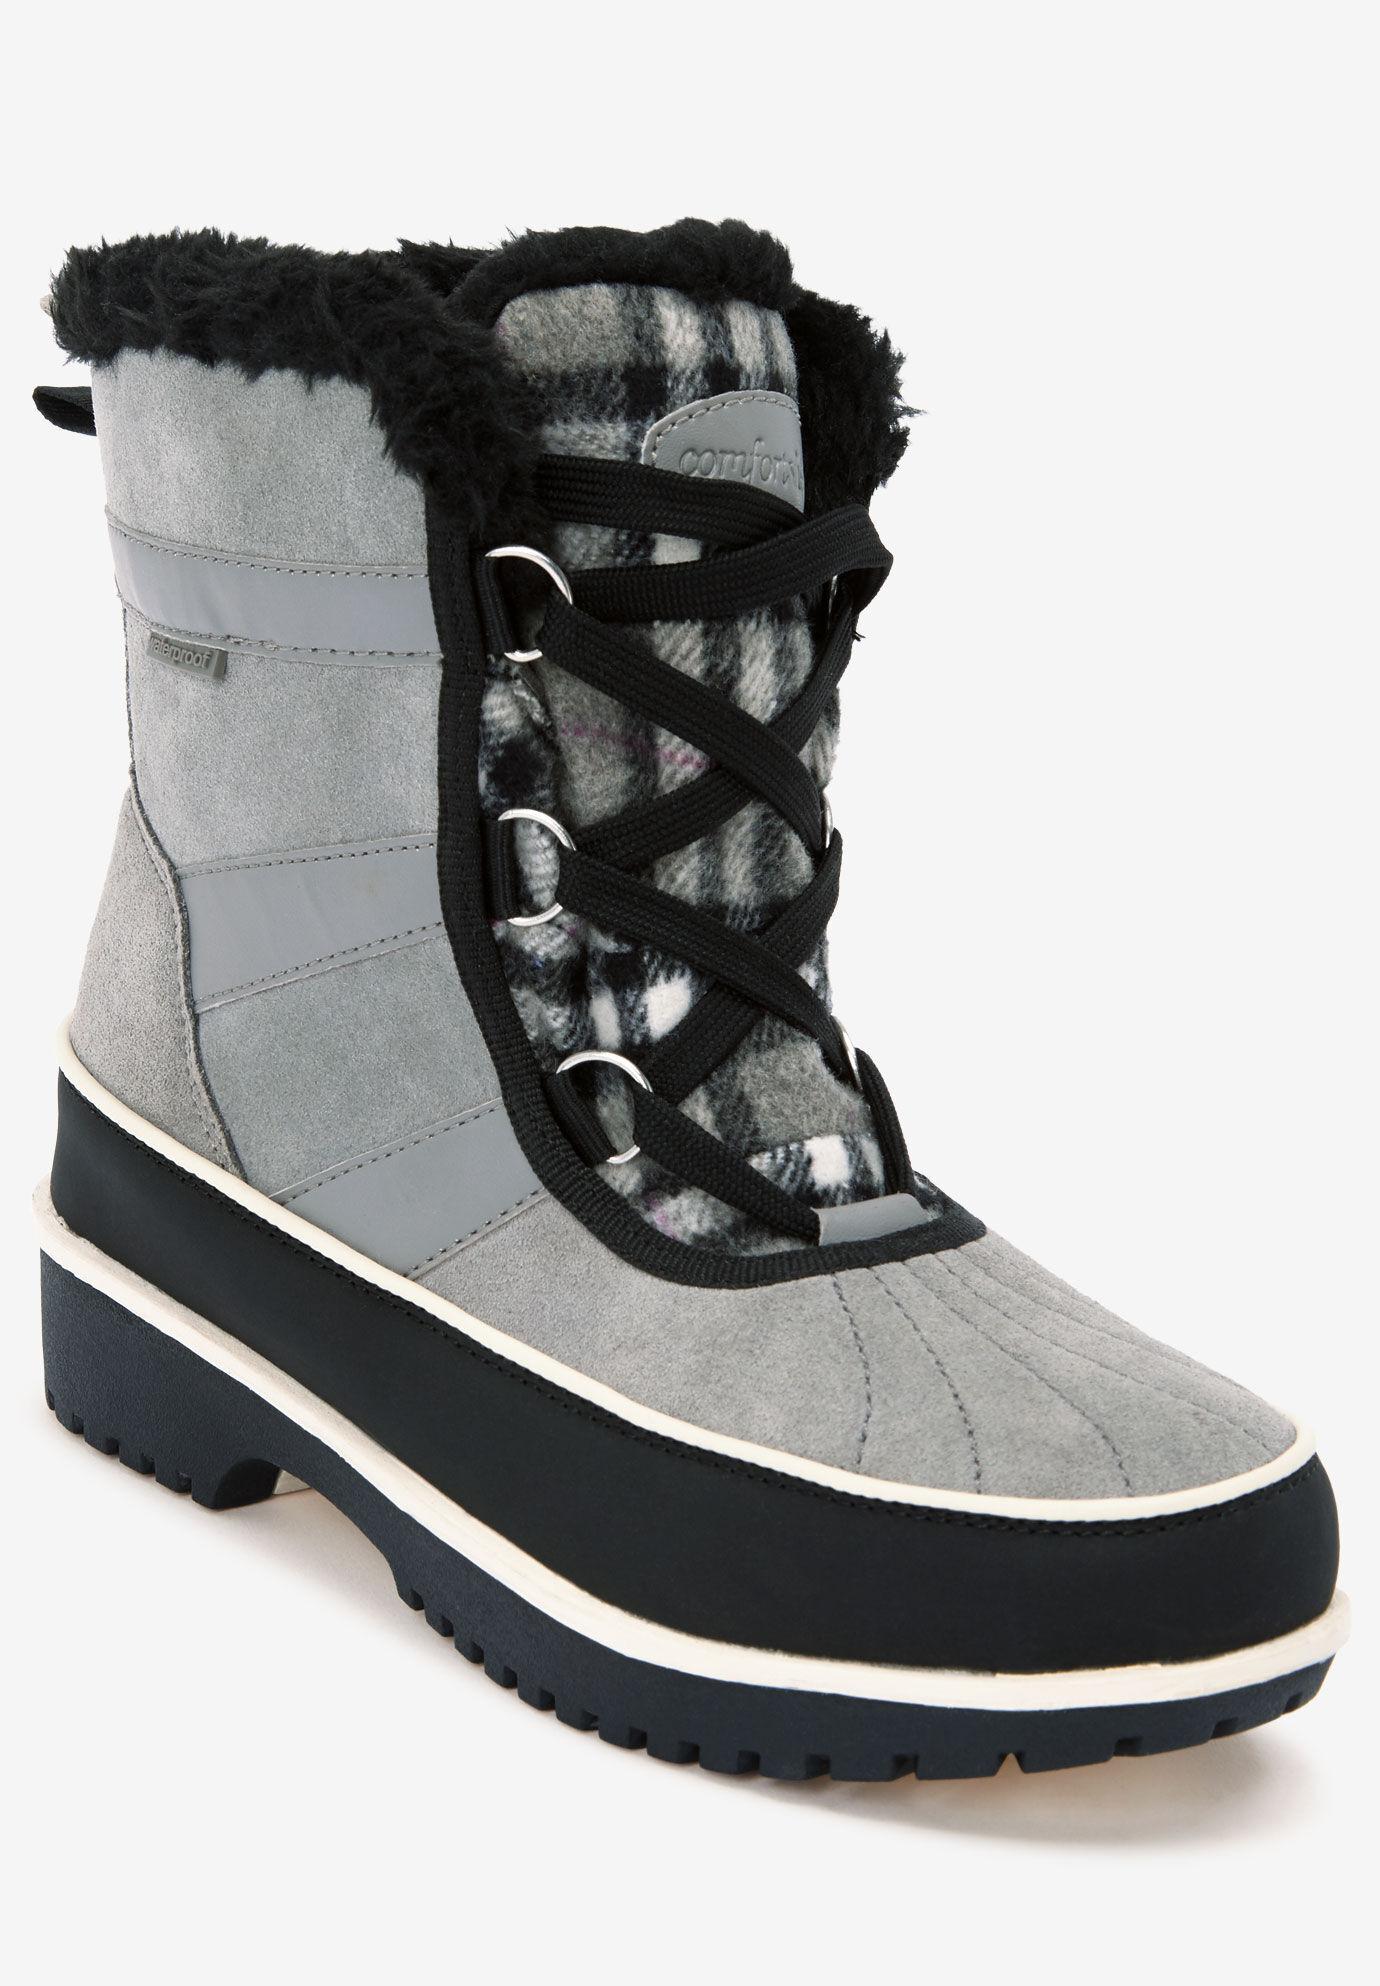 Wide Width Winter Boots for Women | One